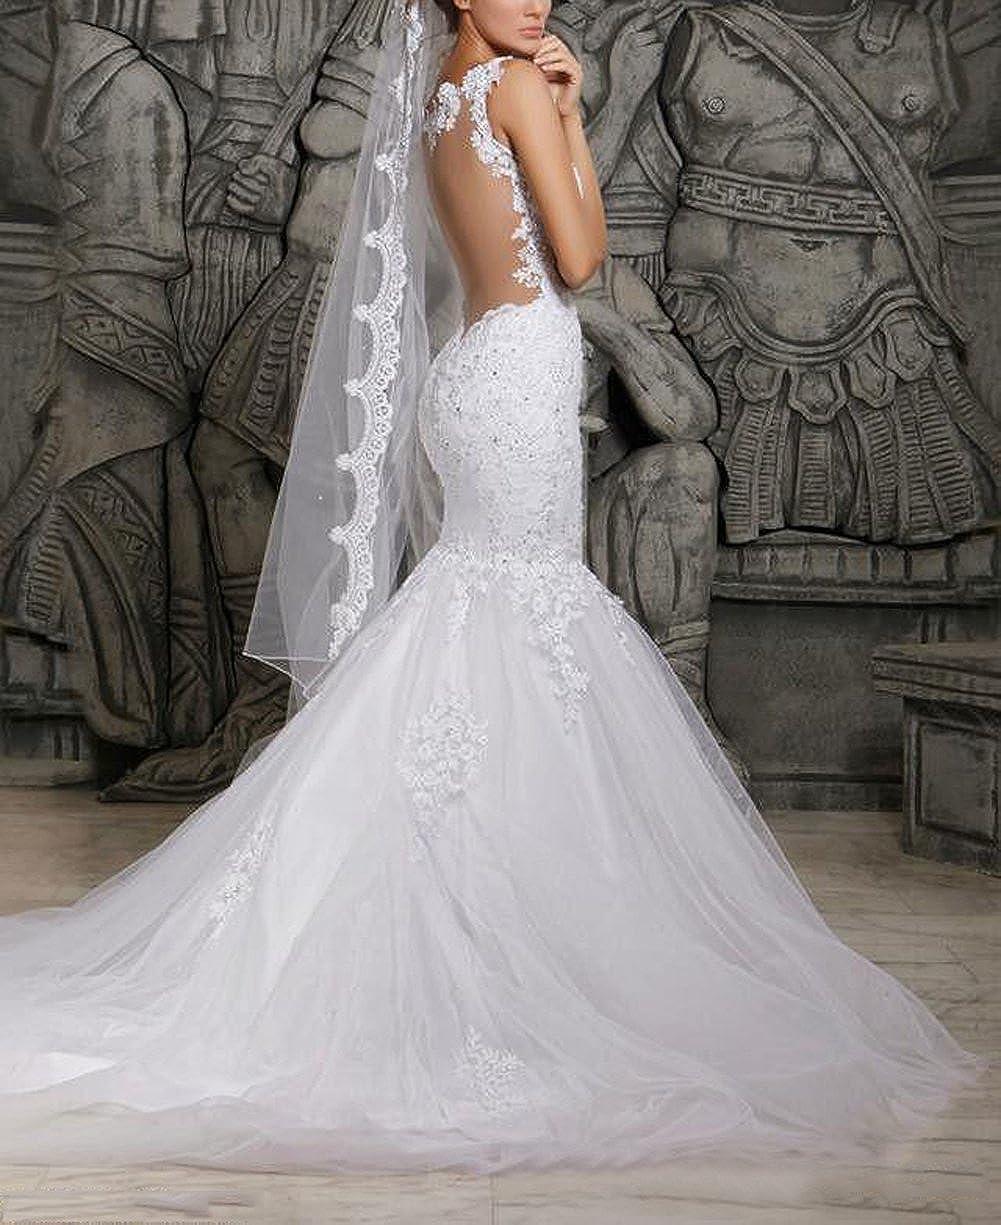 DMDRS Women Mermaid Lace Backless Spaghetti Wedding Dresses Bridal